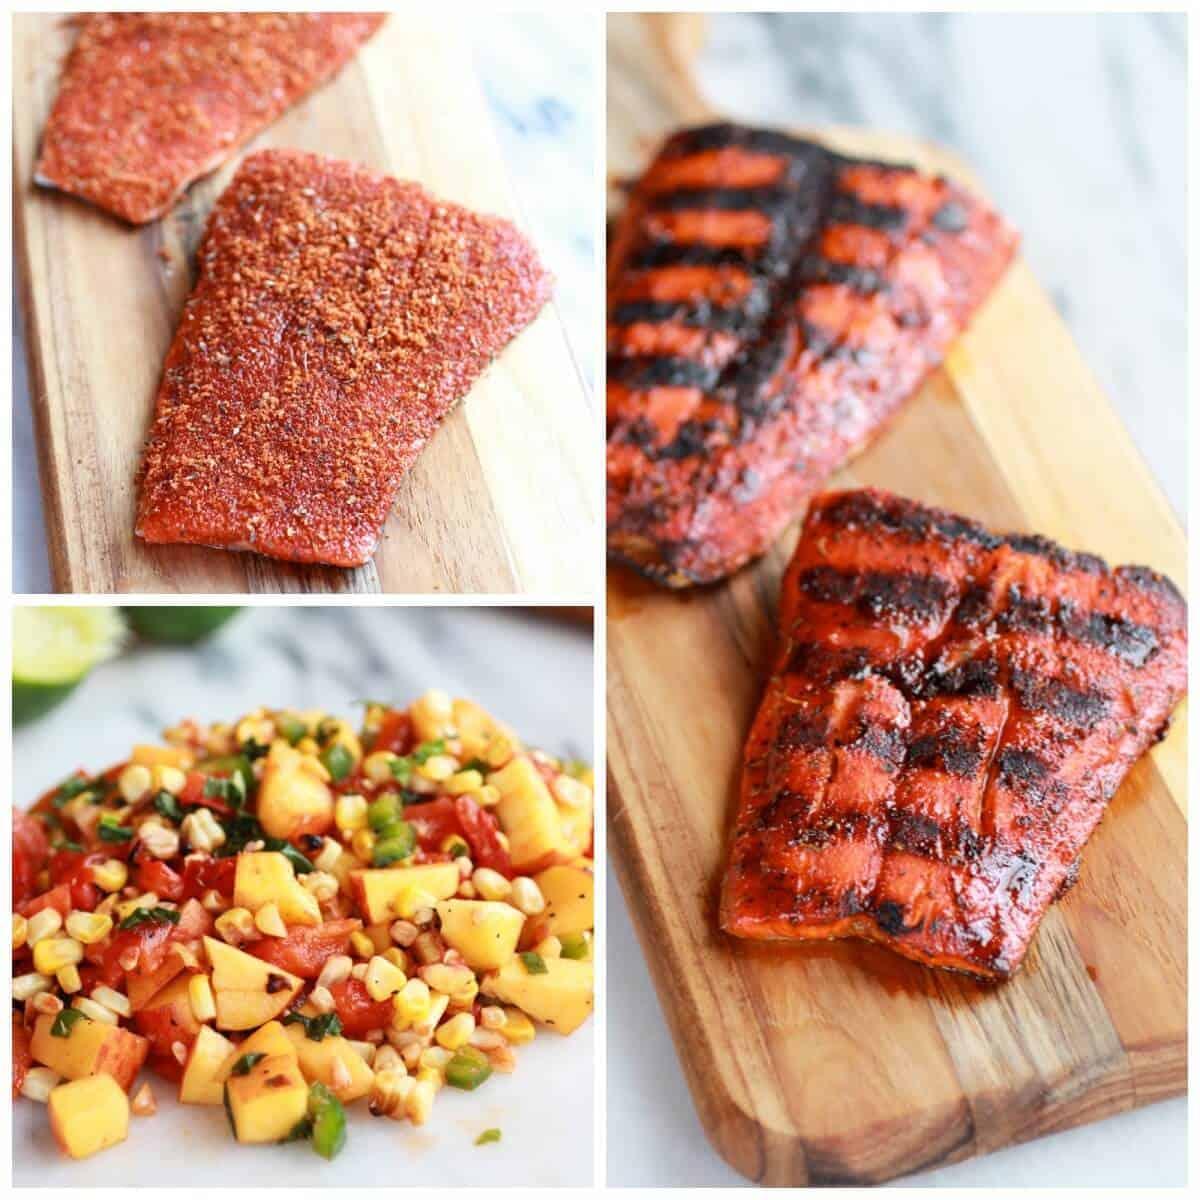 Blackened Salmon with Cheesy Polenta and Spicy Peach + Chard Corn Salsa | halfbakedharvest.com